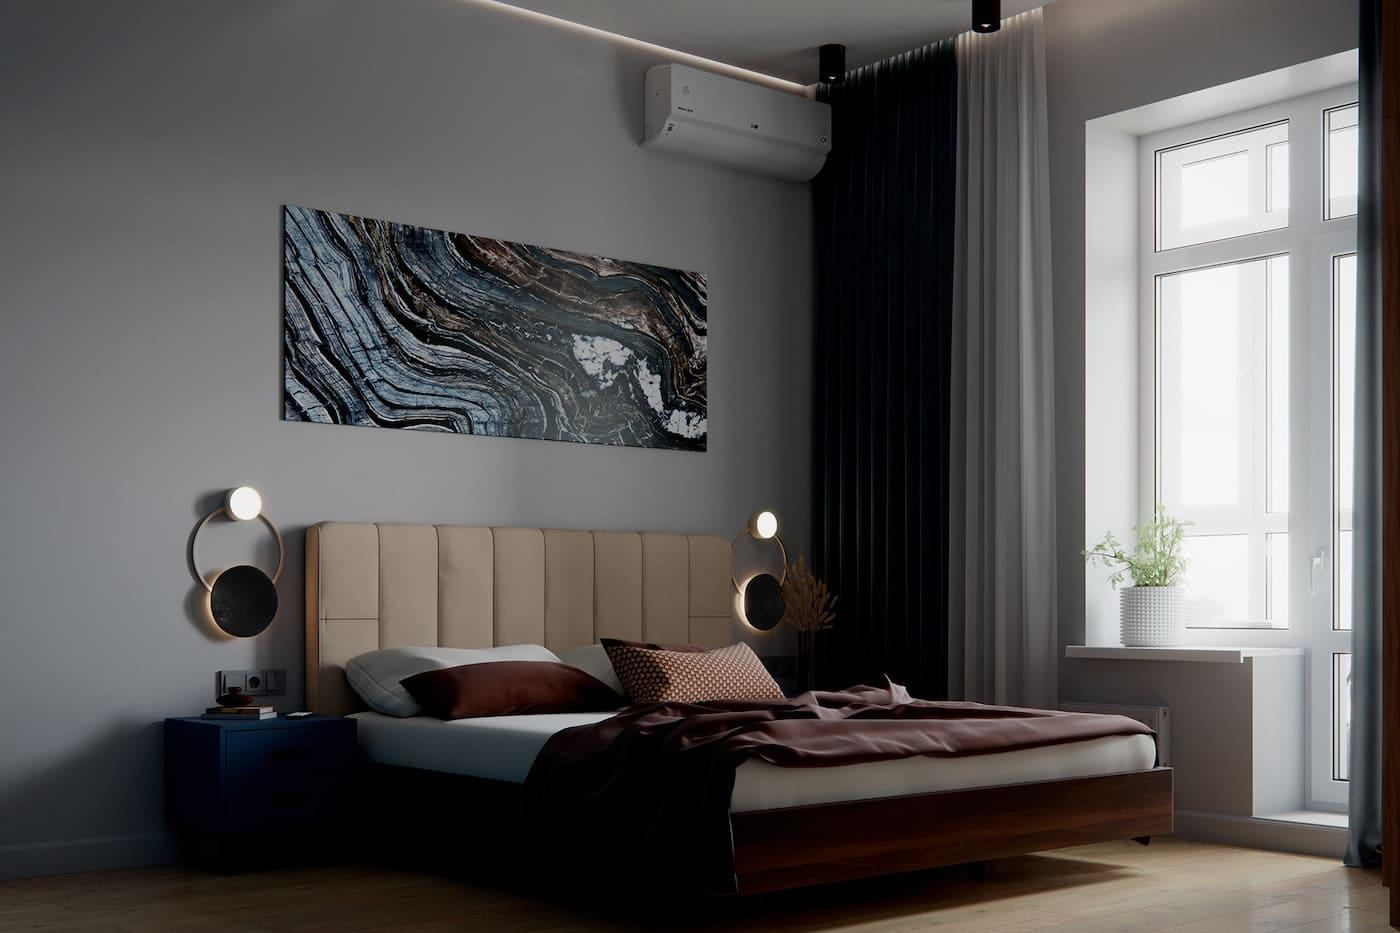 модный дизайн интерьера квартиры фото 66